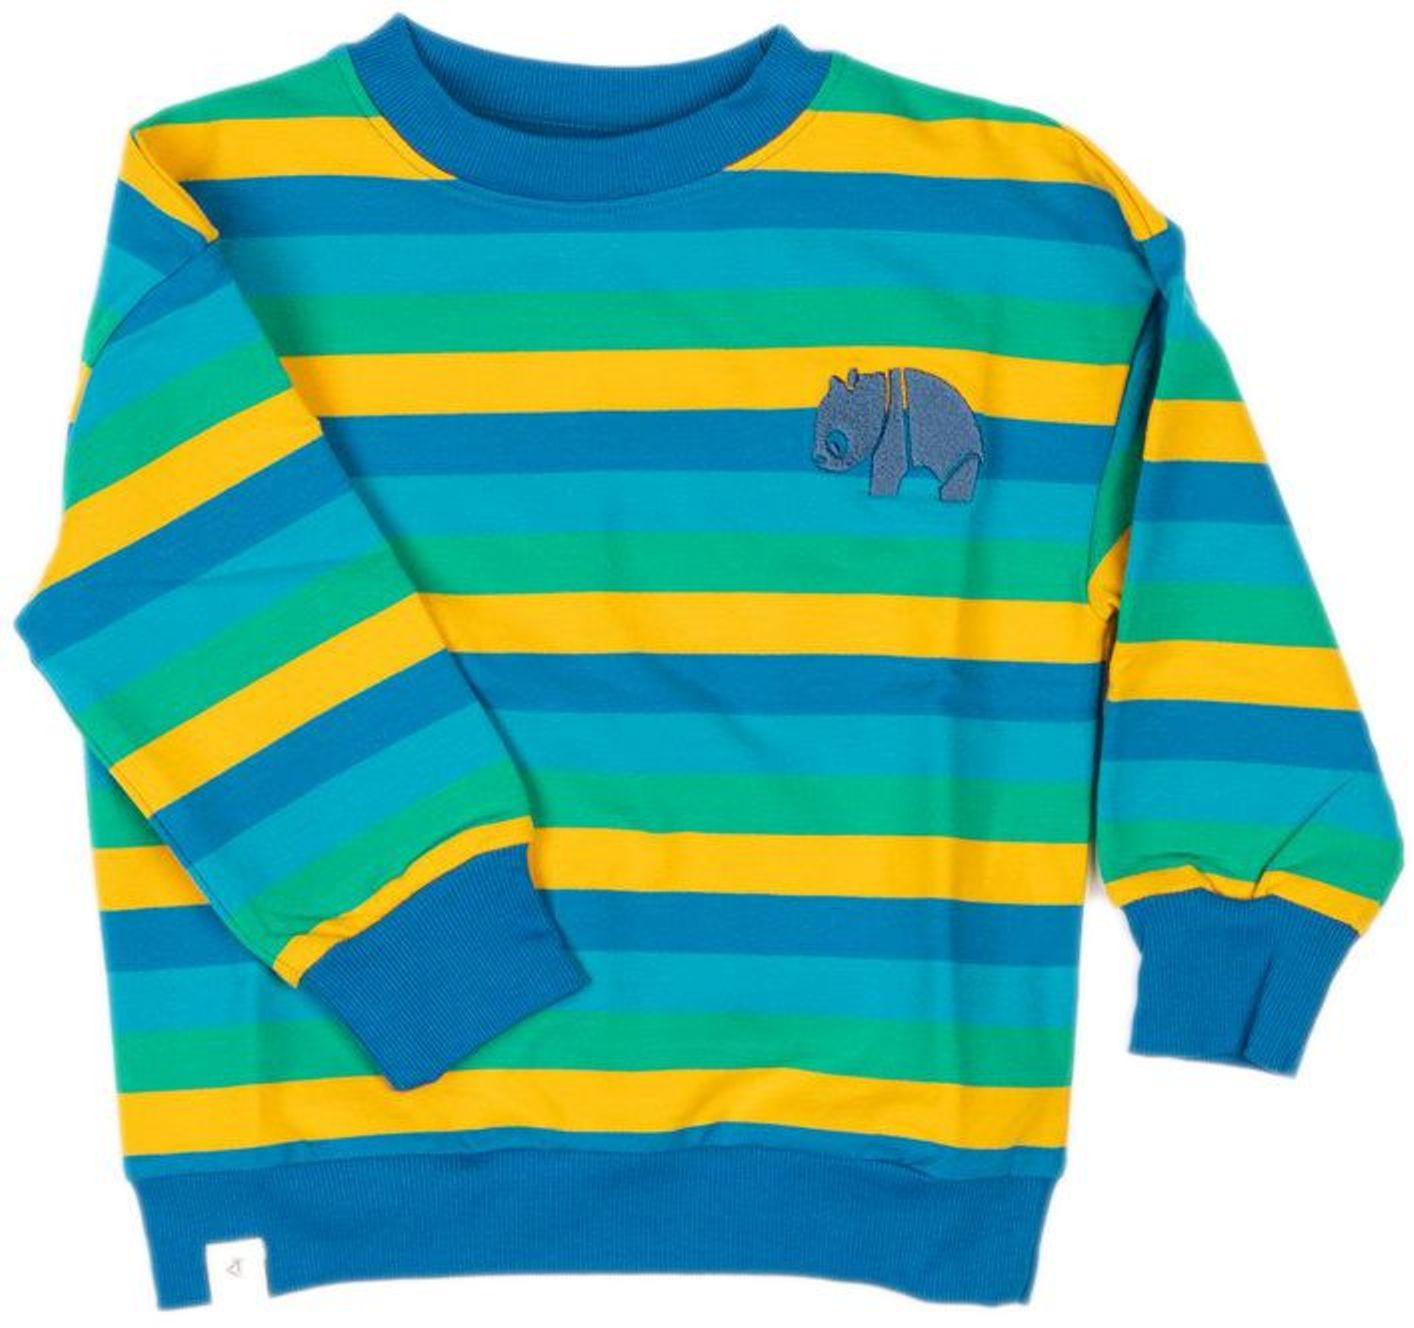 Alba of Denmark Boy Sweatshirt My Favorite emerald big stripes